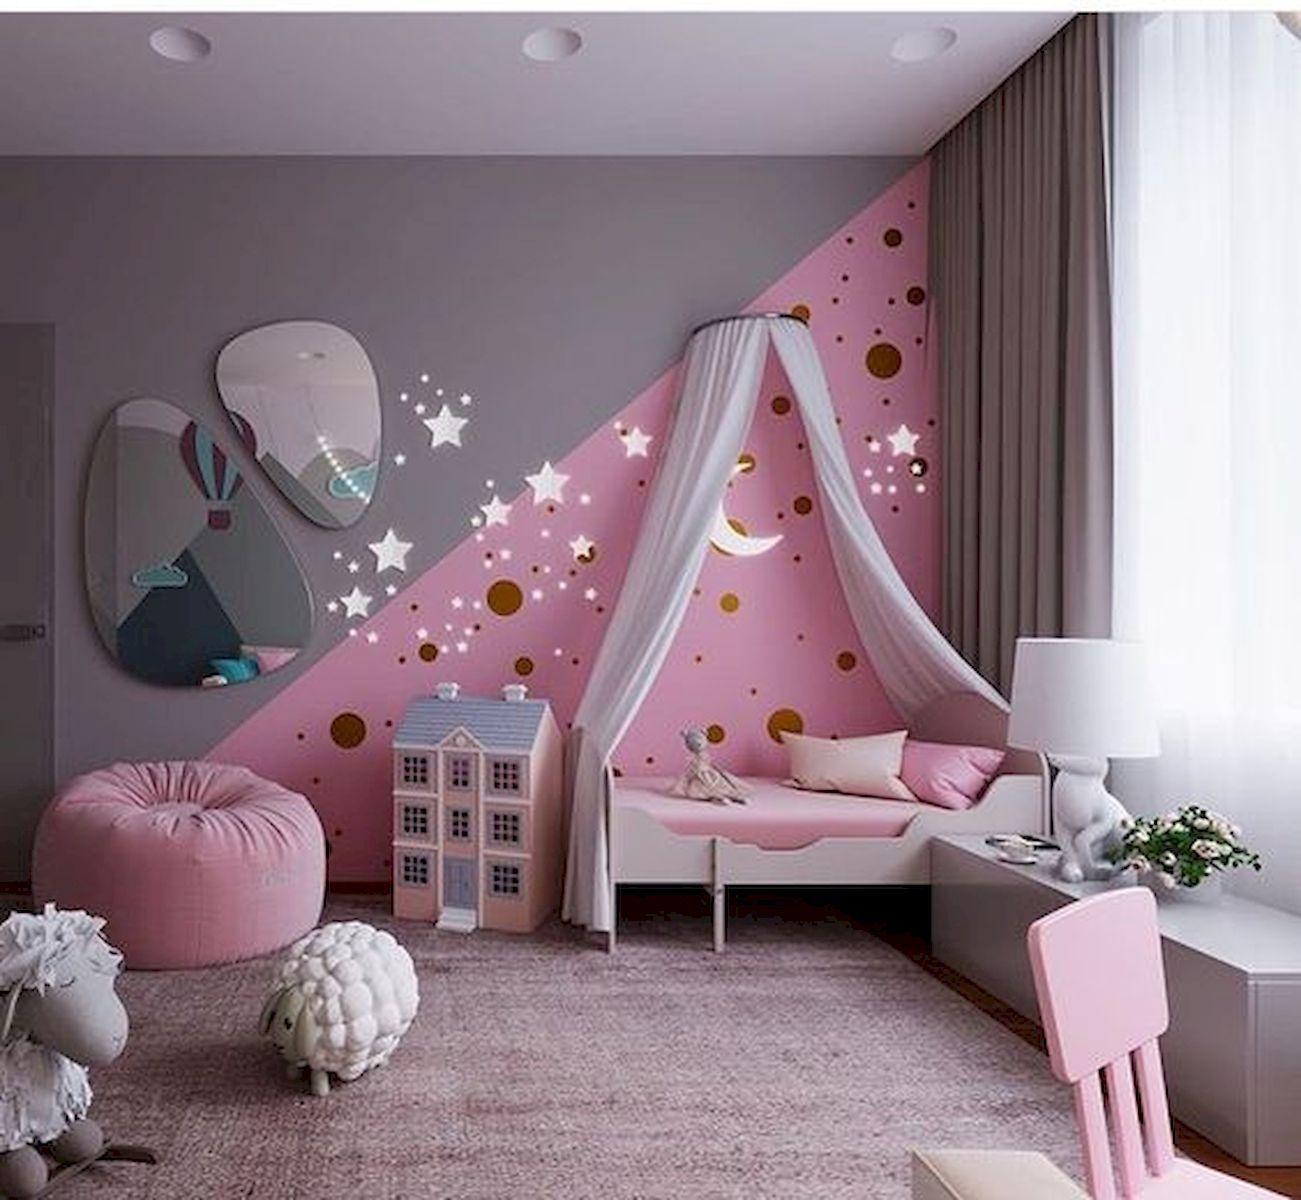 33 Adorable Nursery Room Ideas For Girl (10) | Baby Room Decor, Modern Childrens Room, Girl Room